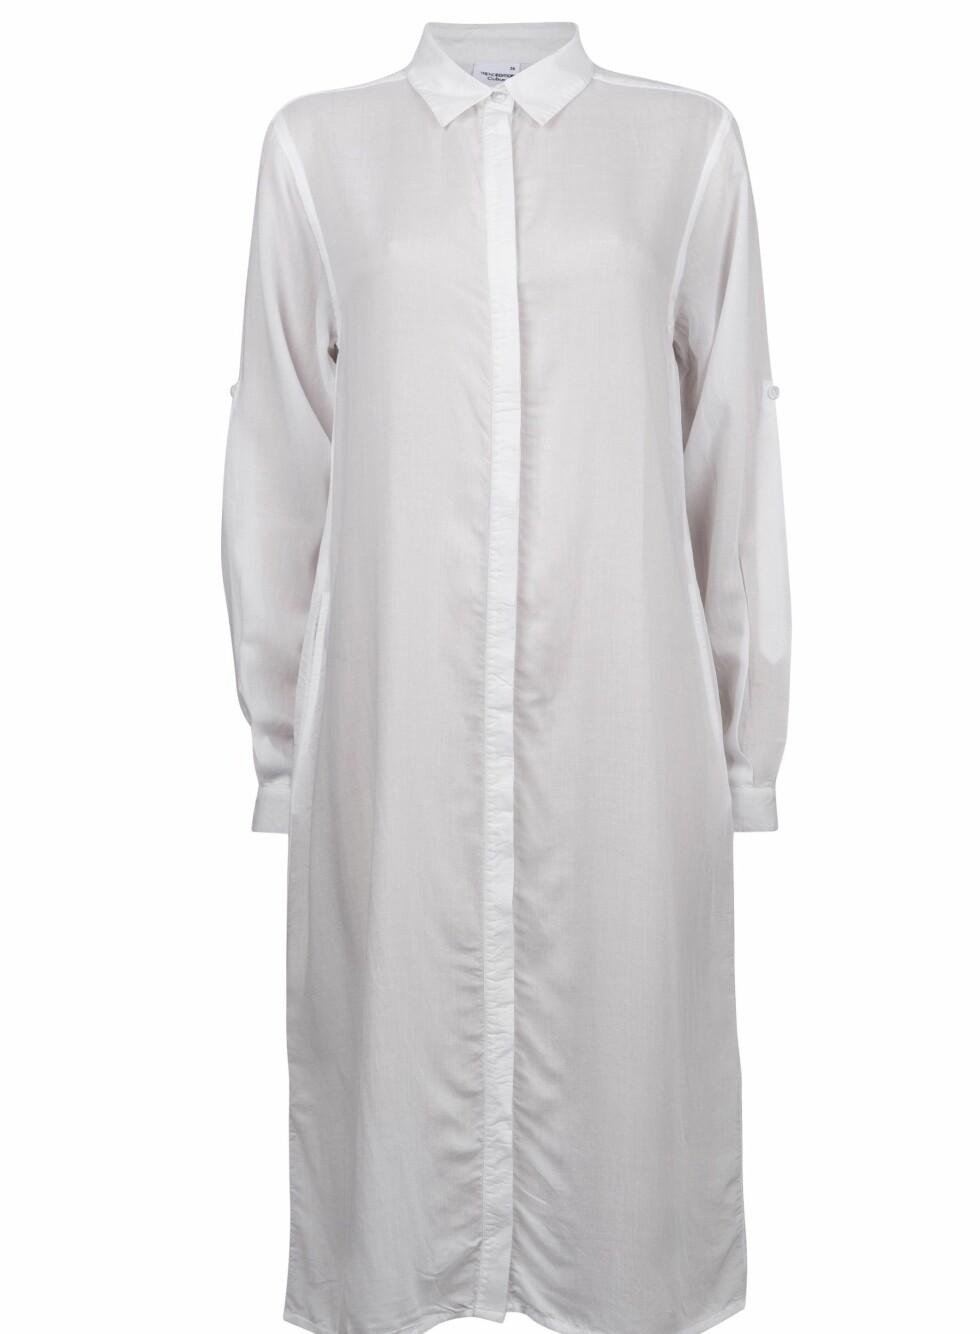 Lang skjorte (kr 500, Cubus).